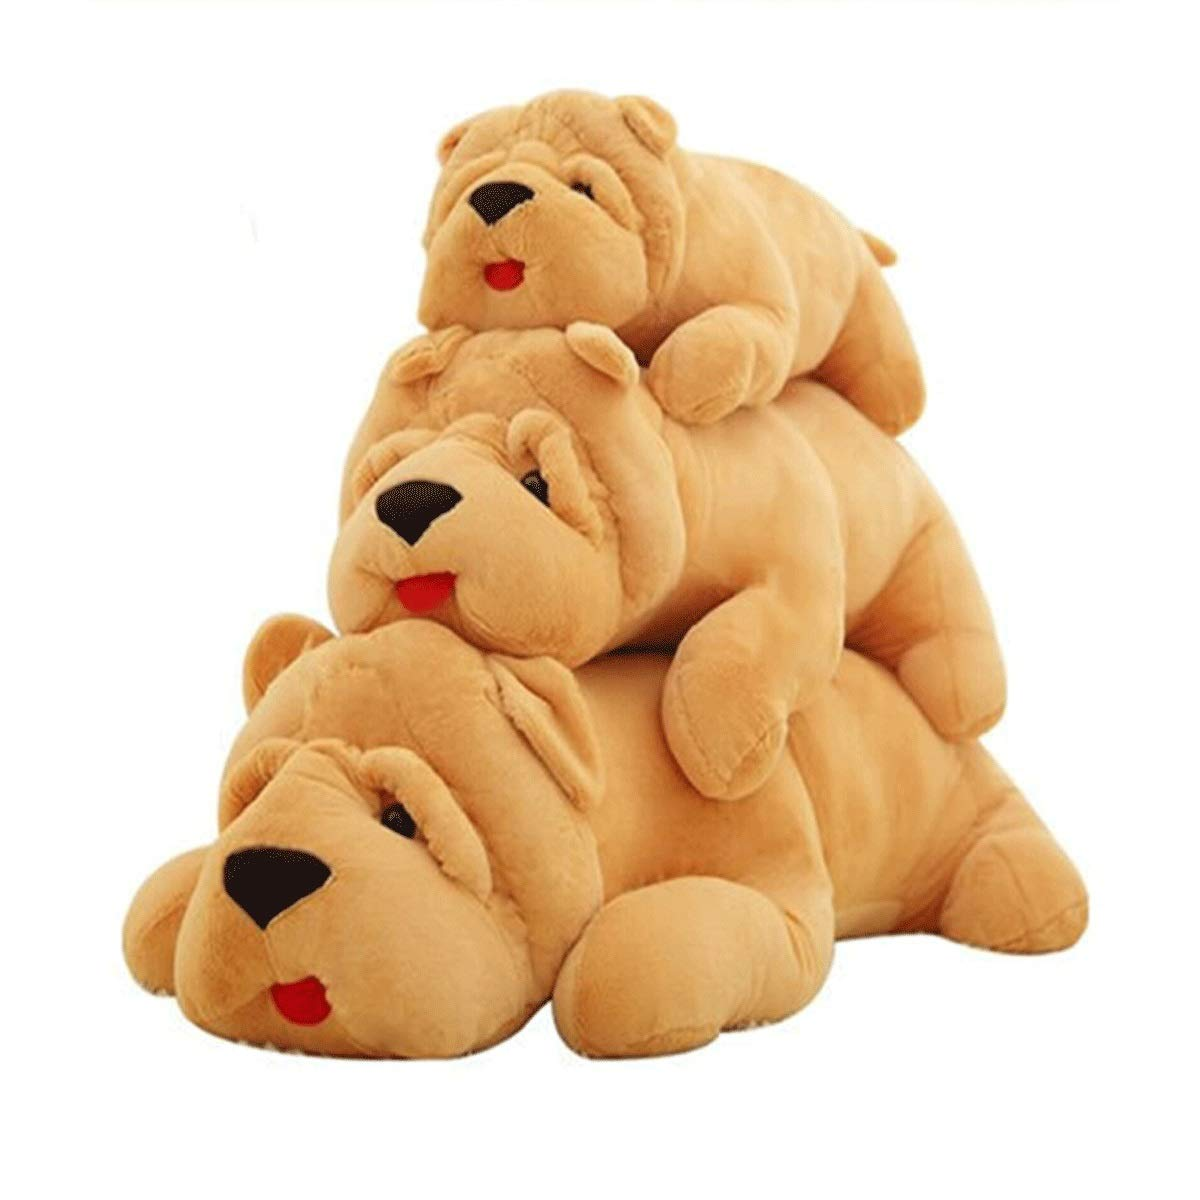 120cm Xionghaizi Plush Toy Dog, Pillow, Large Rag Doll, Dog Figurine, Plush Dog, Birthday Present, Light Brown Dog, Multi-Size, Best Gift Latest Models (Size   120cm)